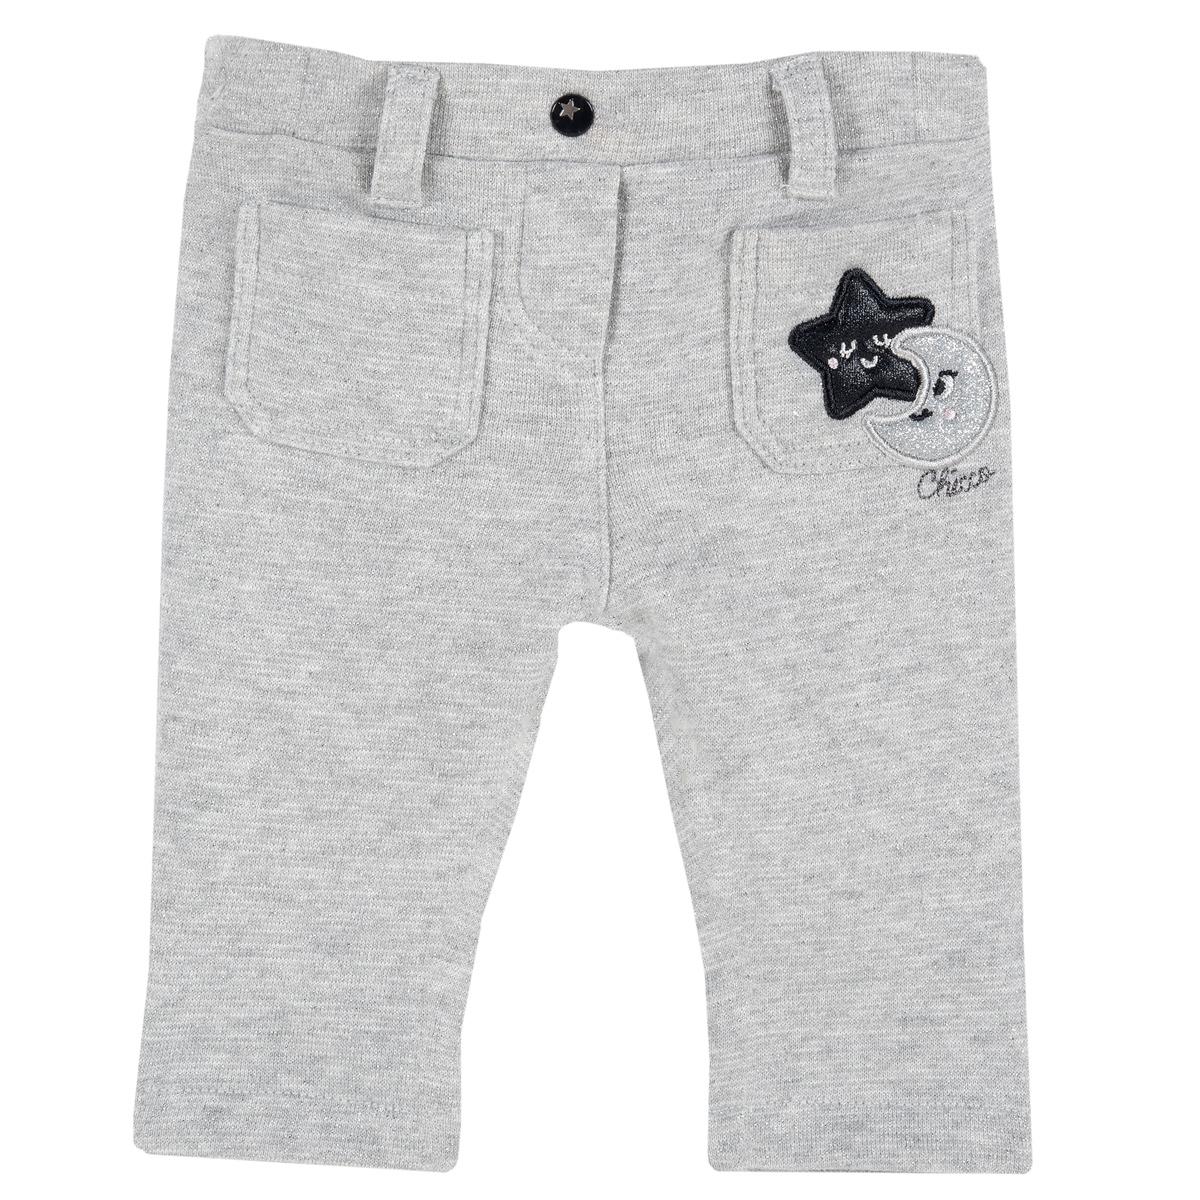 Pantalon lung copii Chicco gri cu aplicatii